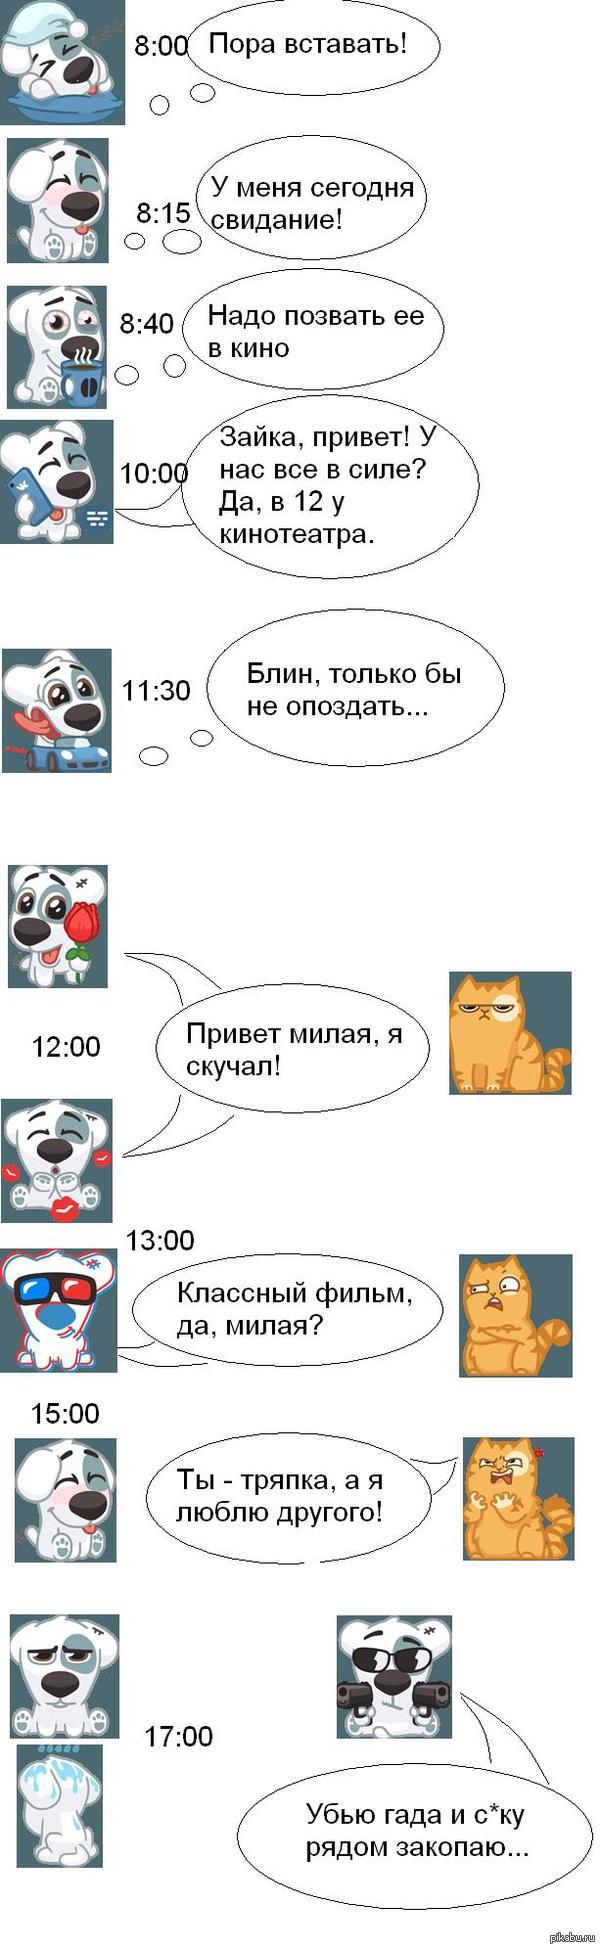 "Спотти По мотивам <a href=""http://pikabu.ru/story/persik_20_3425949"">http://pikabu.ru/story/_3425949</a>"